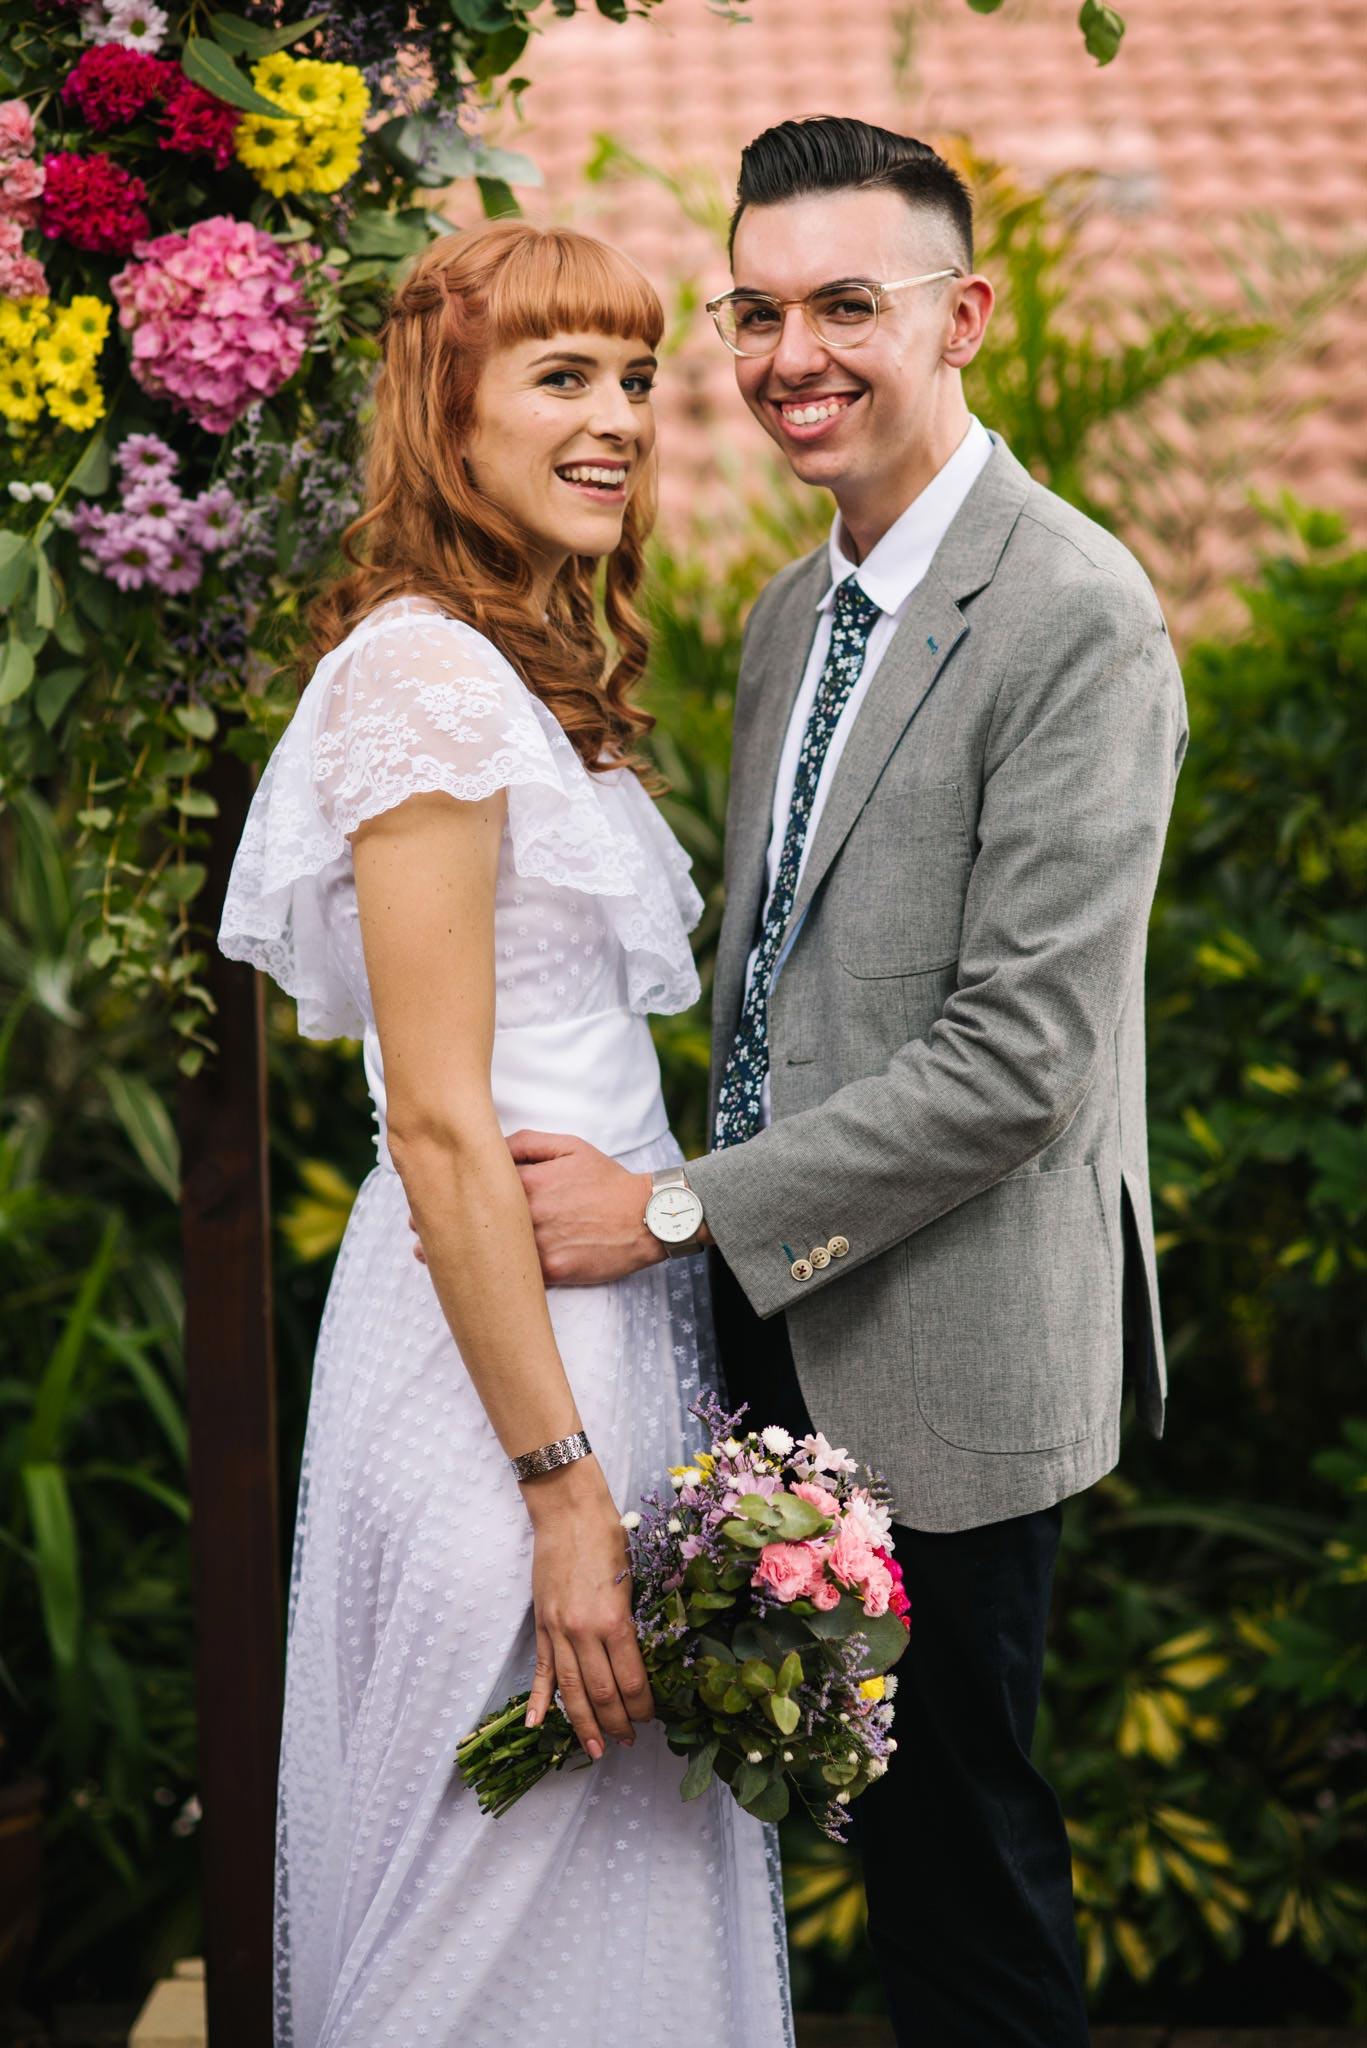 Hipster newlyweds at garden ceremony Sydney